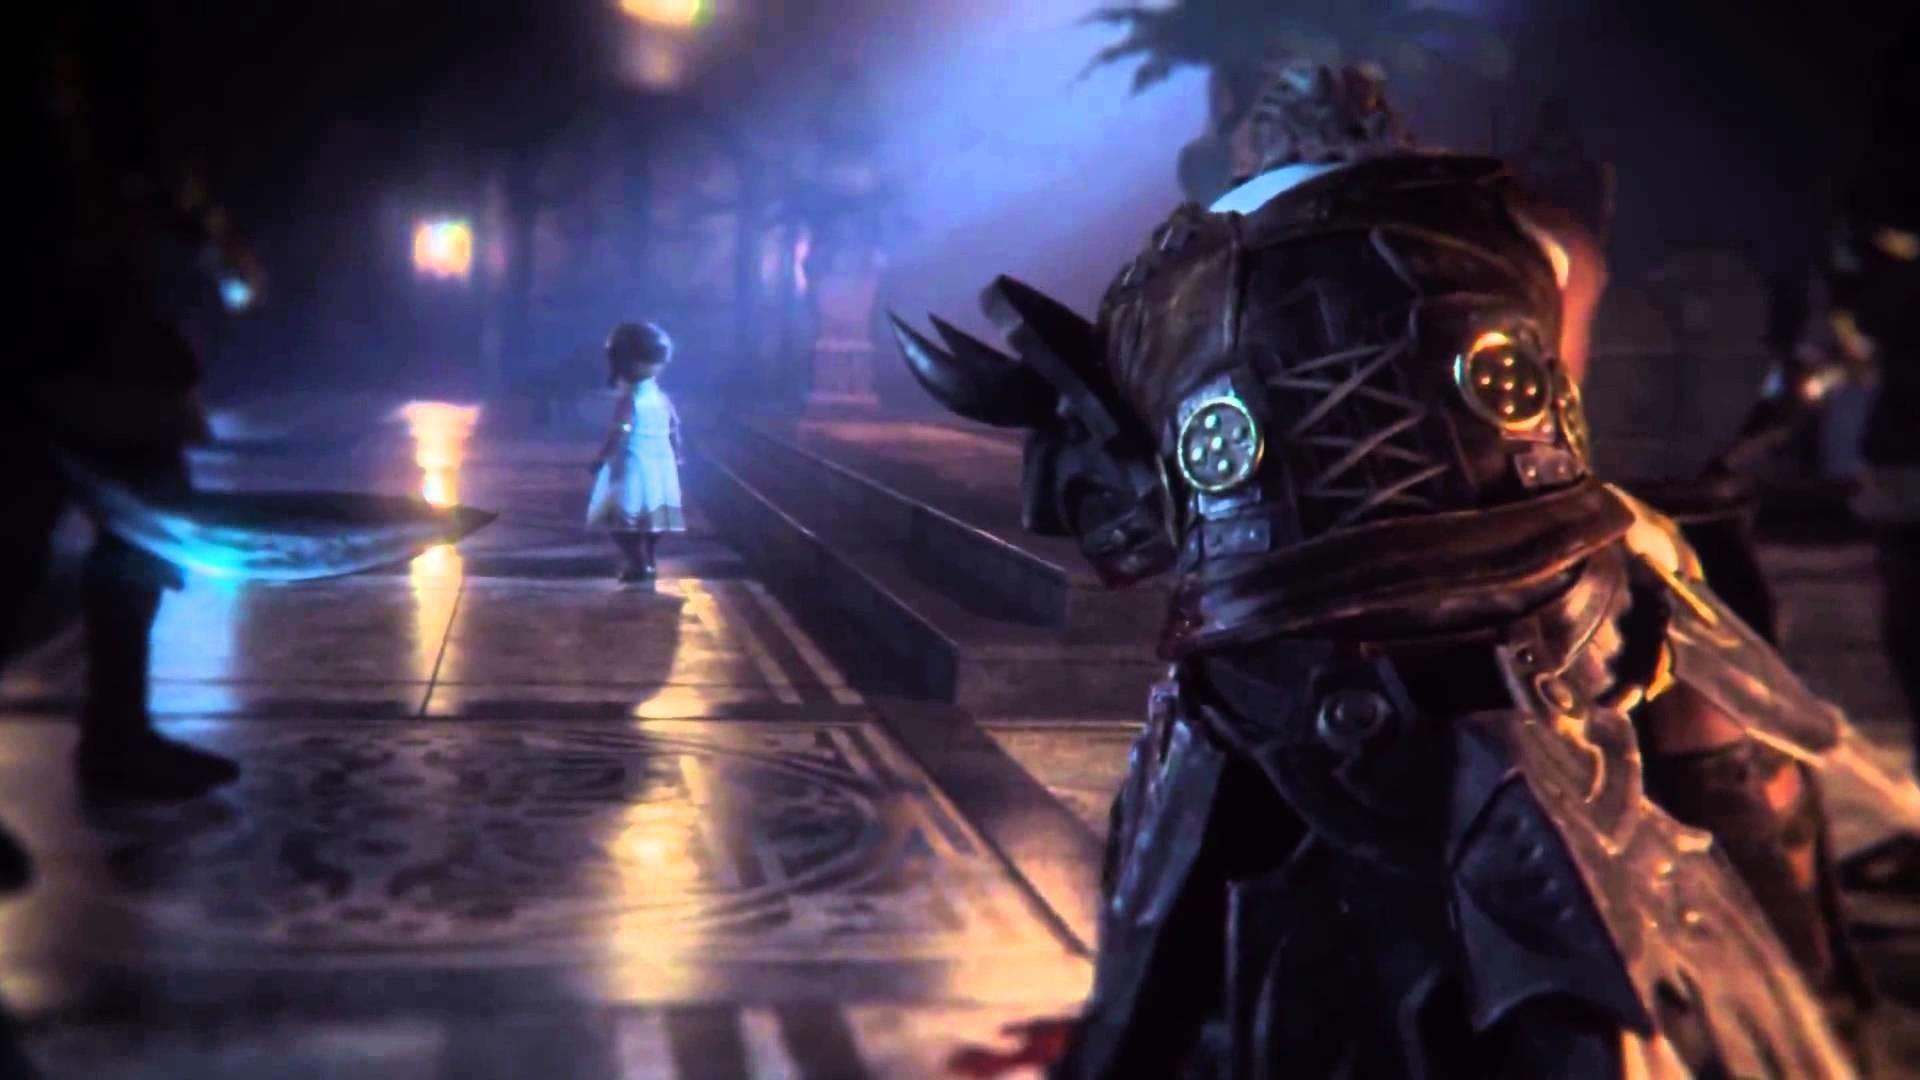 Final Fantasy XIV – Heavensward [CineMatic] 1080p